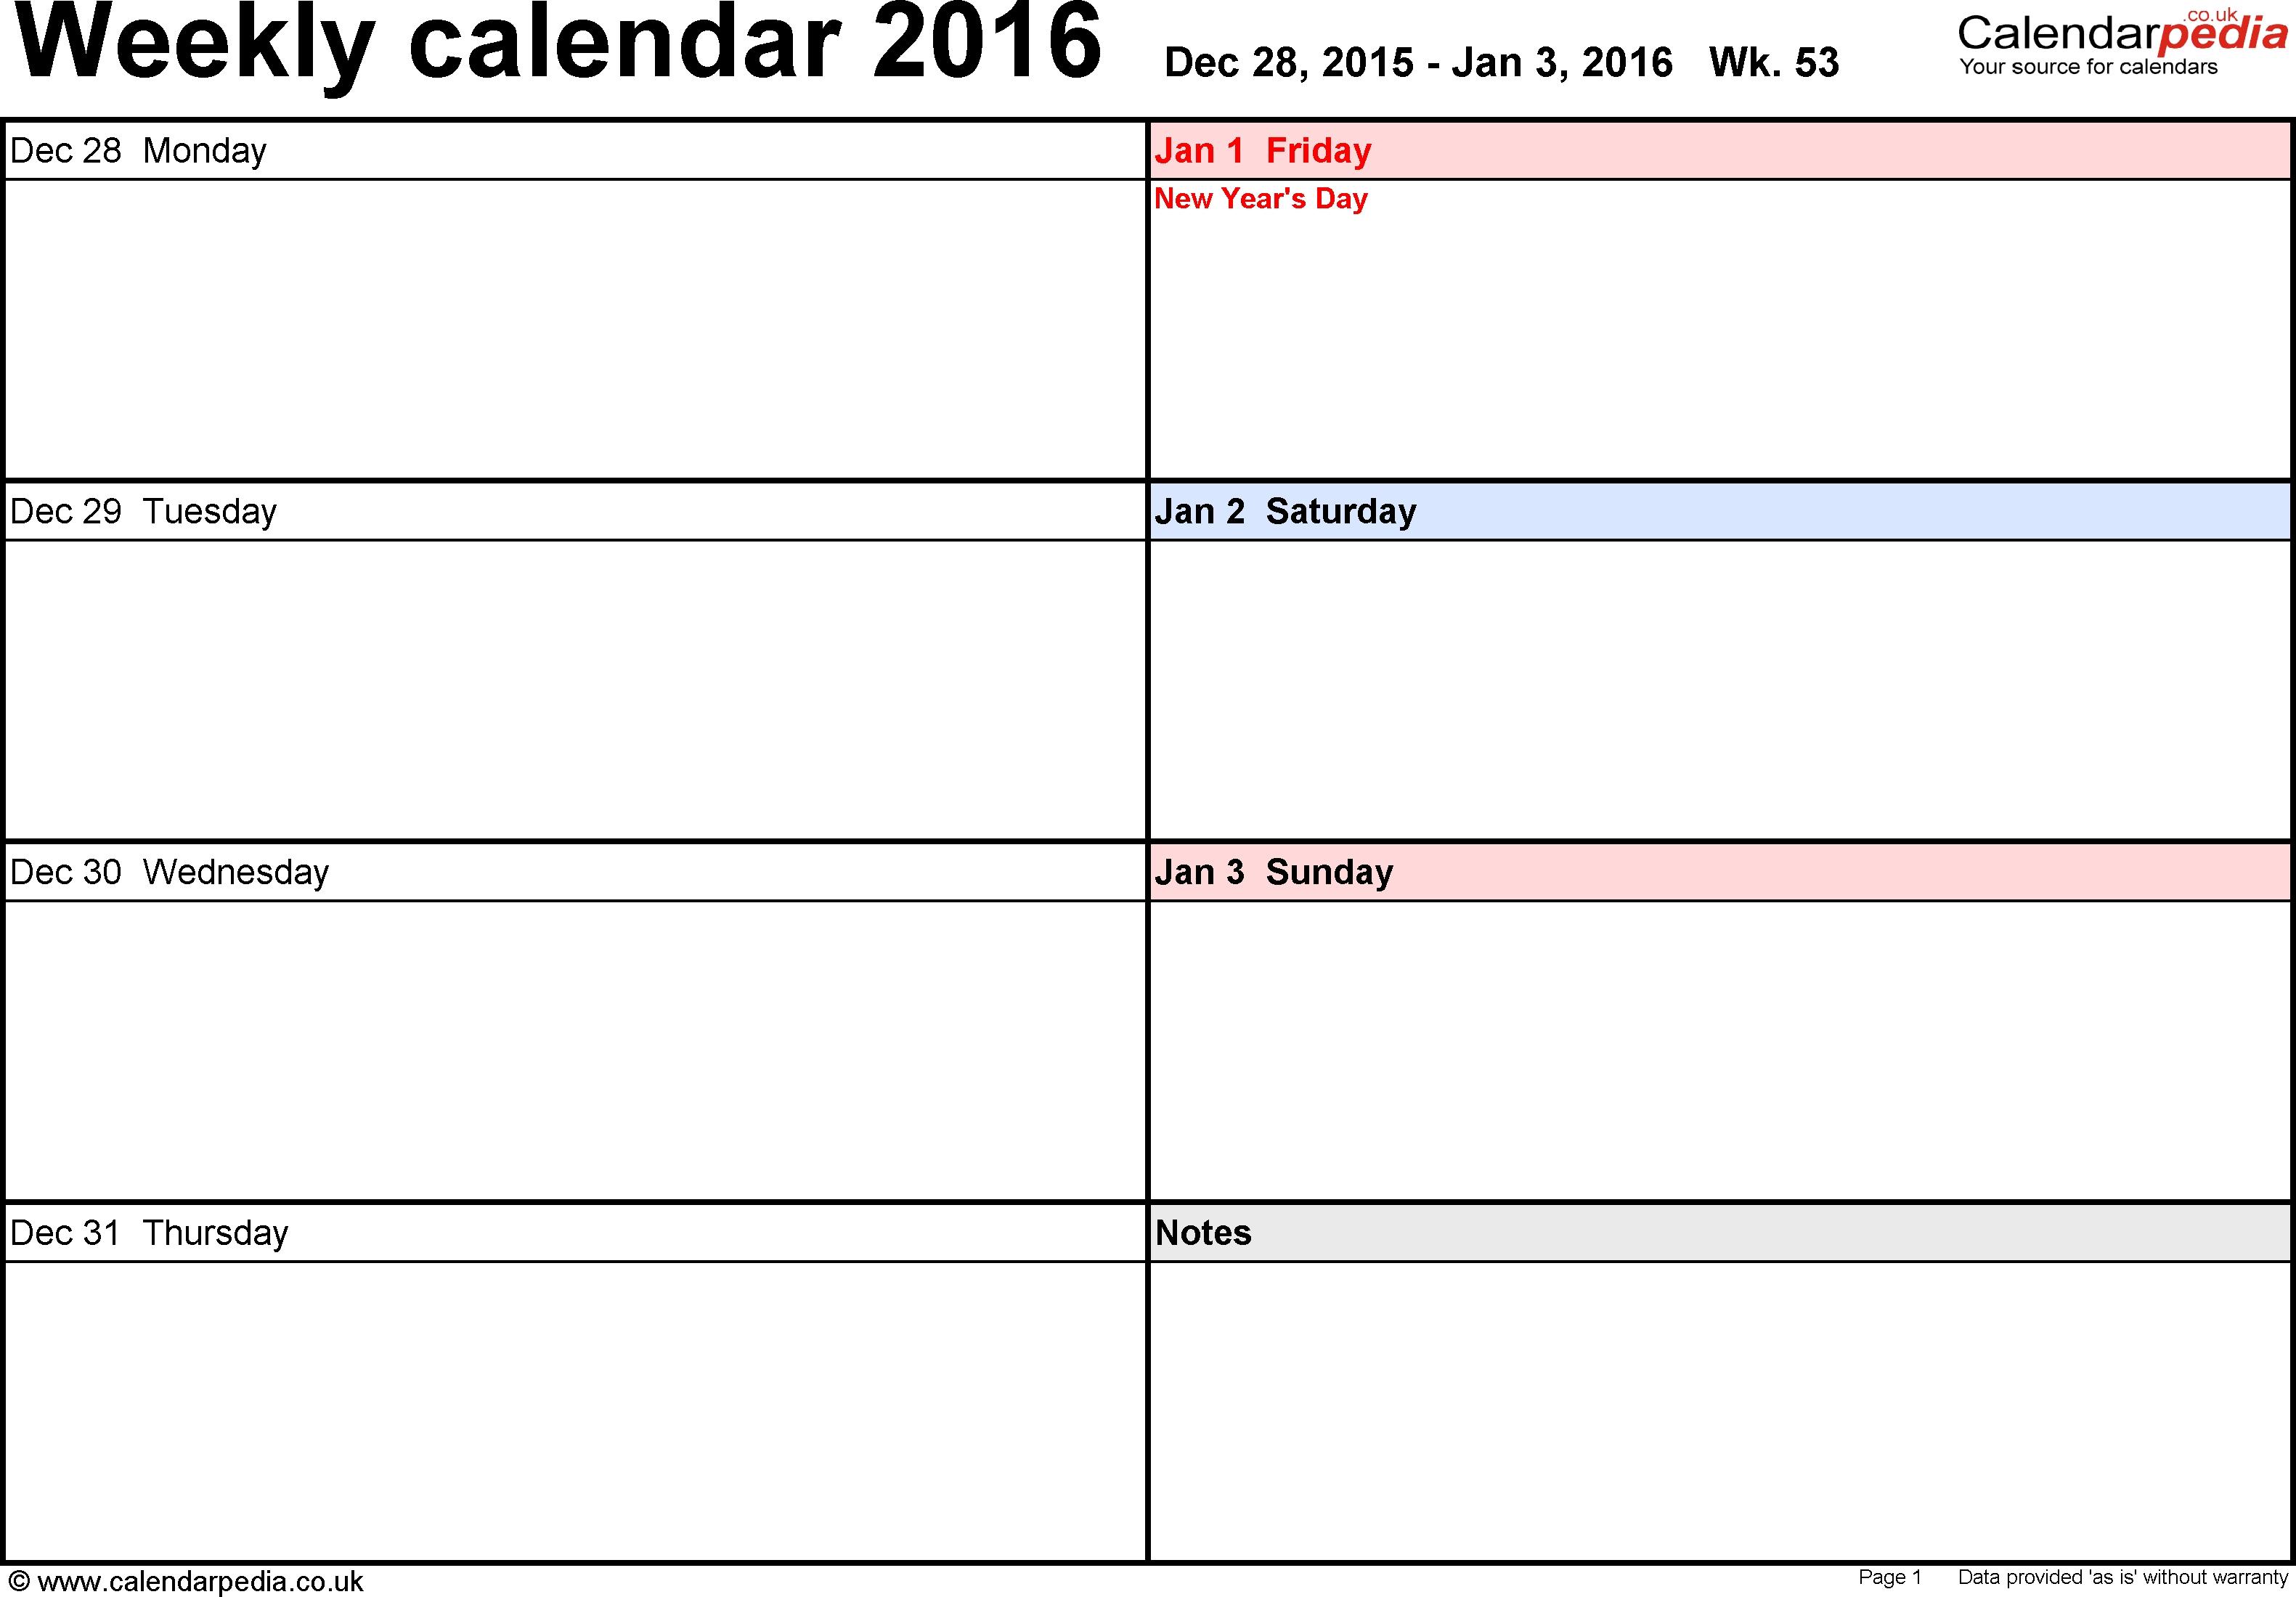 Weekly Schedule Template In Excel Dimonittk  Xjb